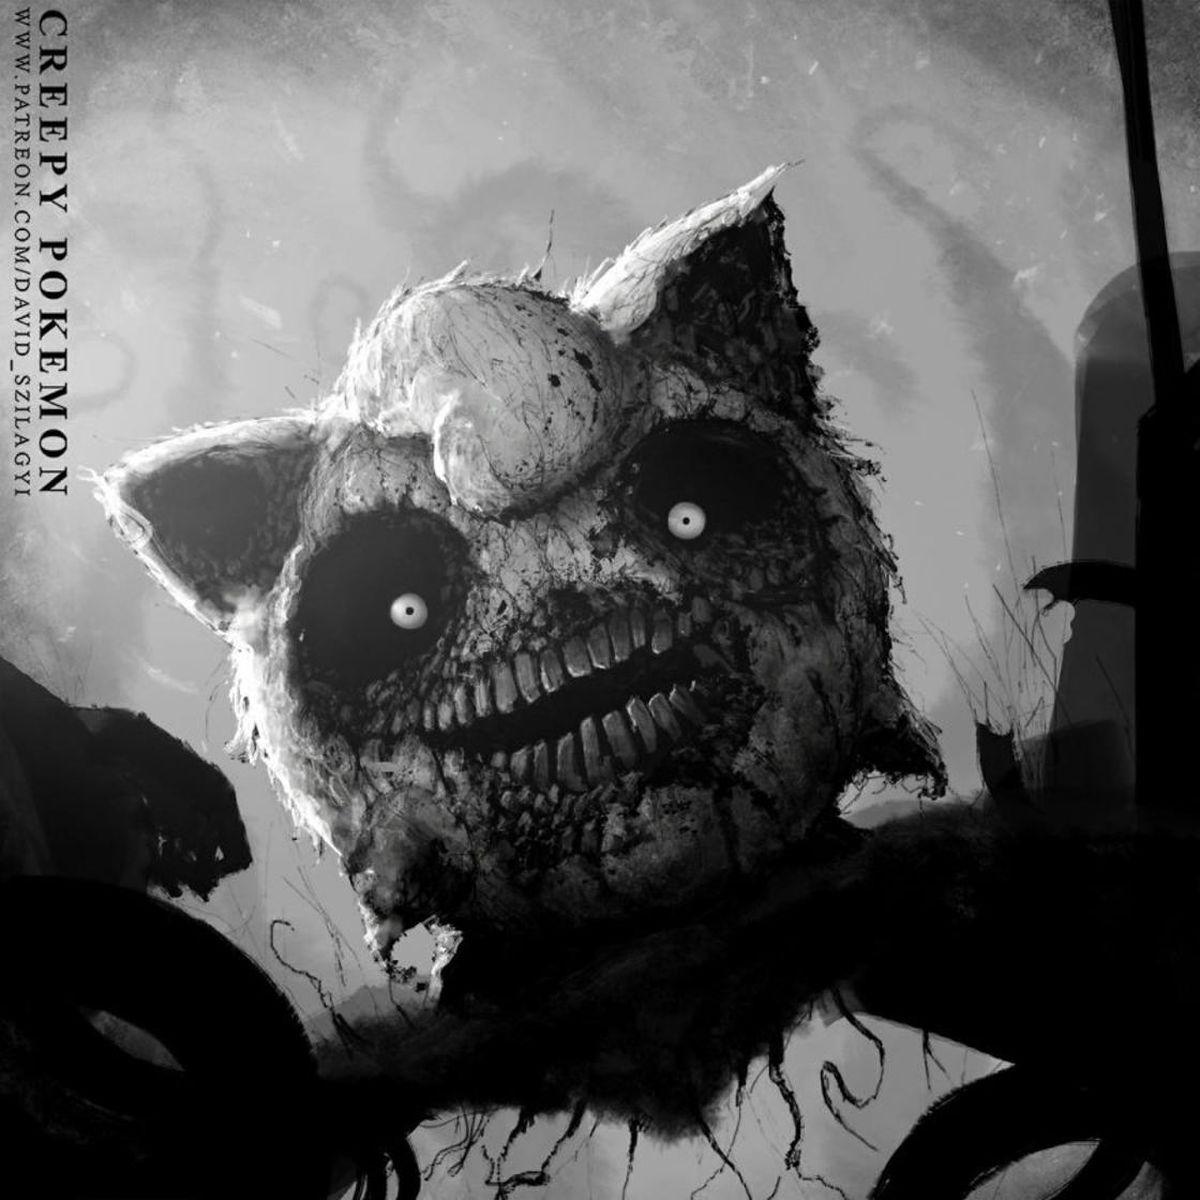 Creepy Pokemon Von David Szilagyi Creepy Pokemon - This artist reimagined pokemon characters with nightmarish results